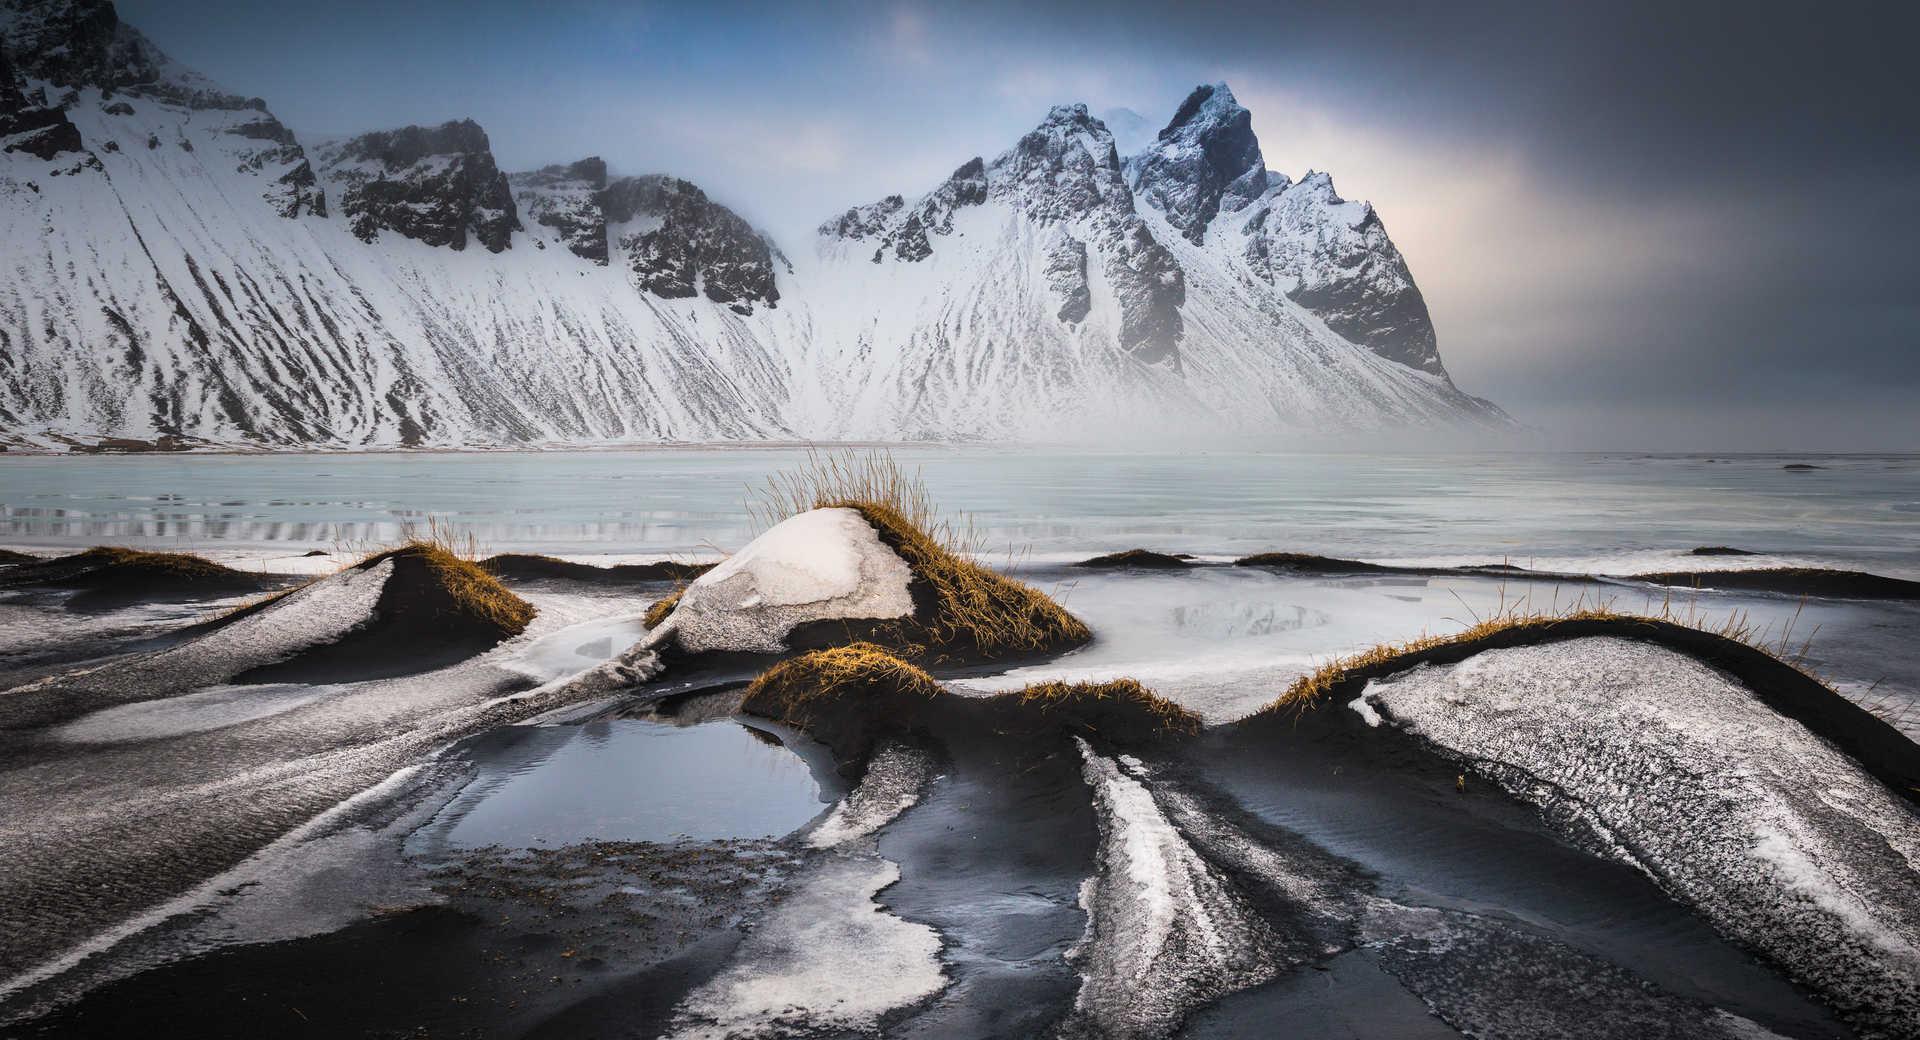 Paysage islandais en hiver